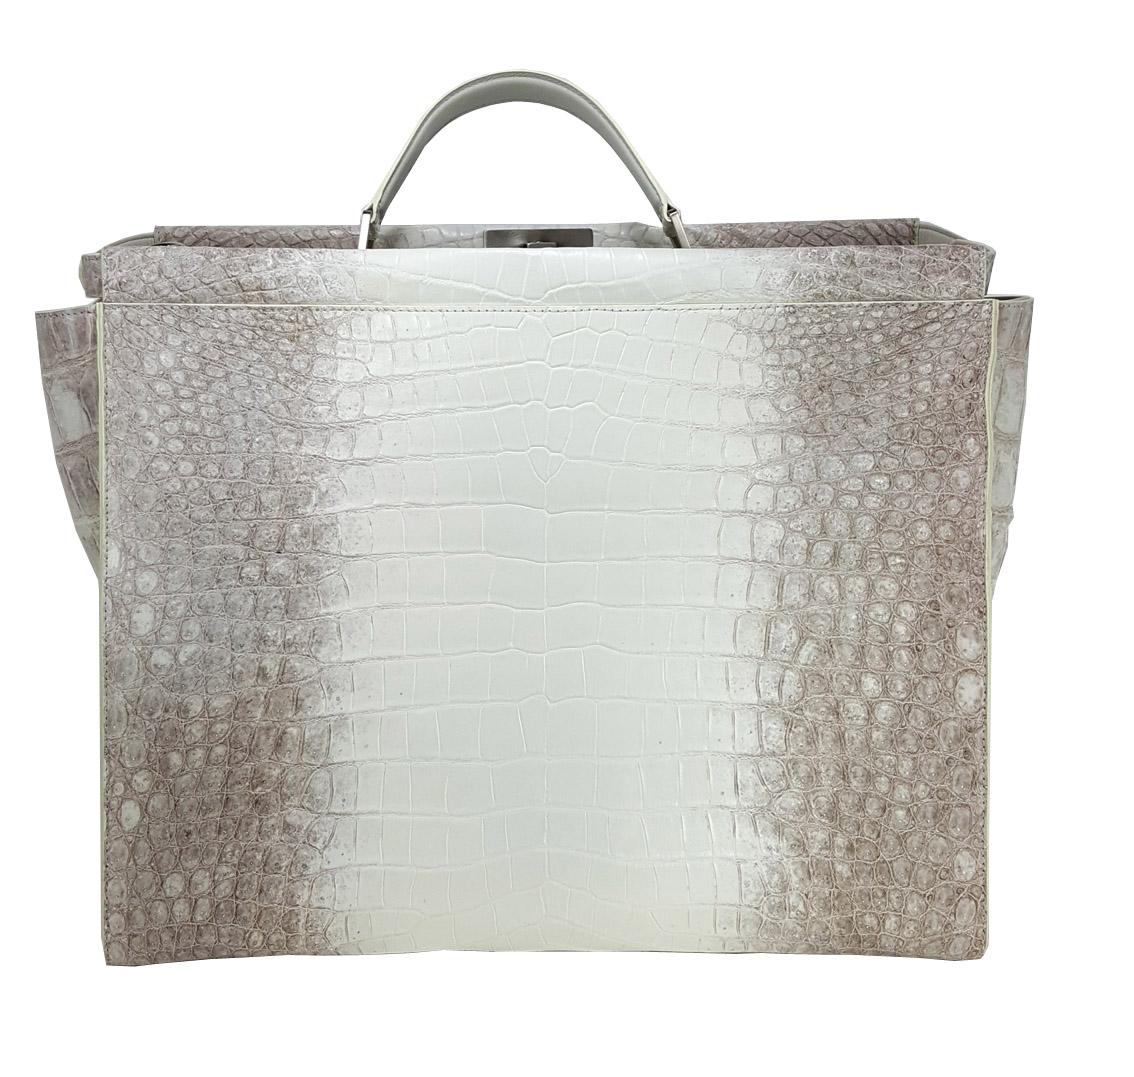 Luxury Crocodile Leather Briefacase for Men Leather : Crododylus Niloticus Color : Himalaya Size : 4...